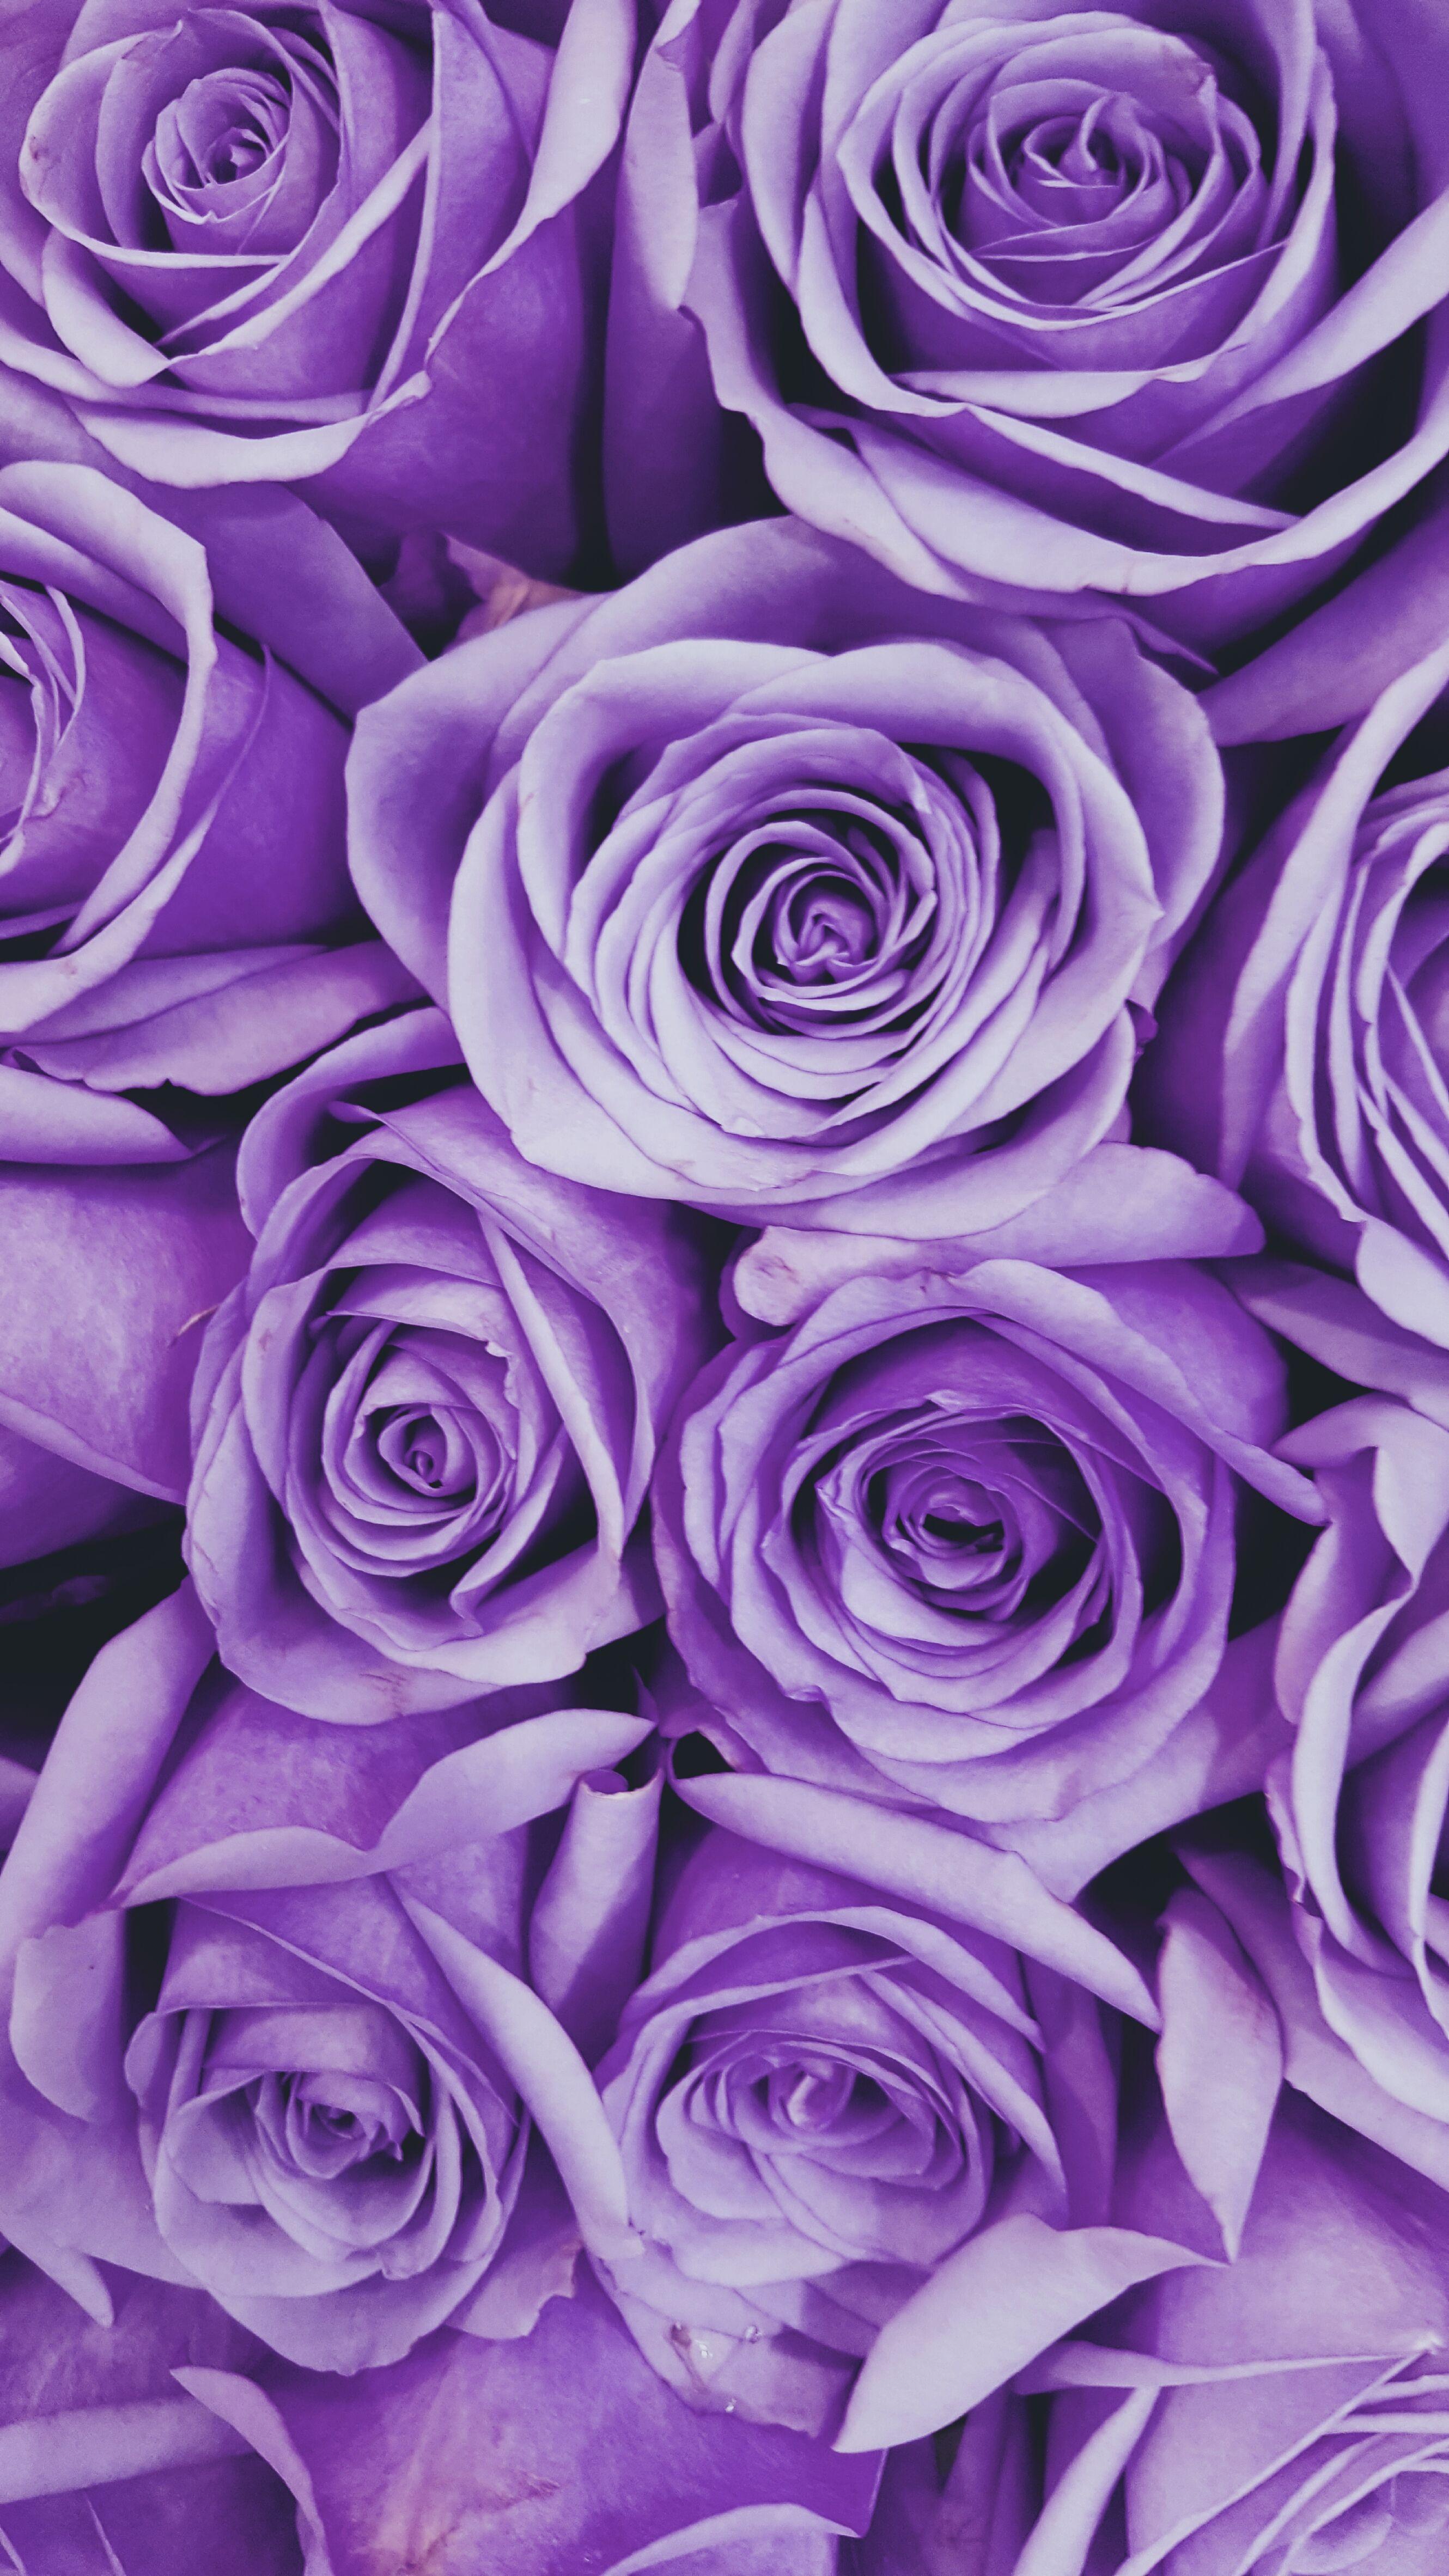 purpleflowers floralart textileart textiledesign